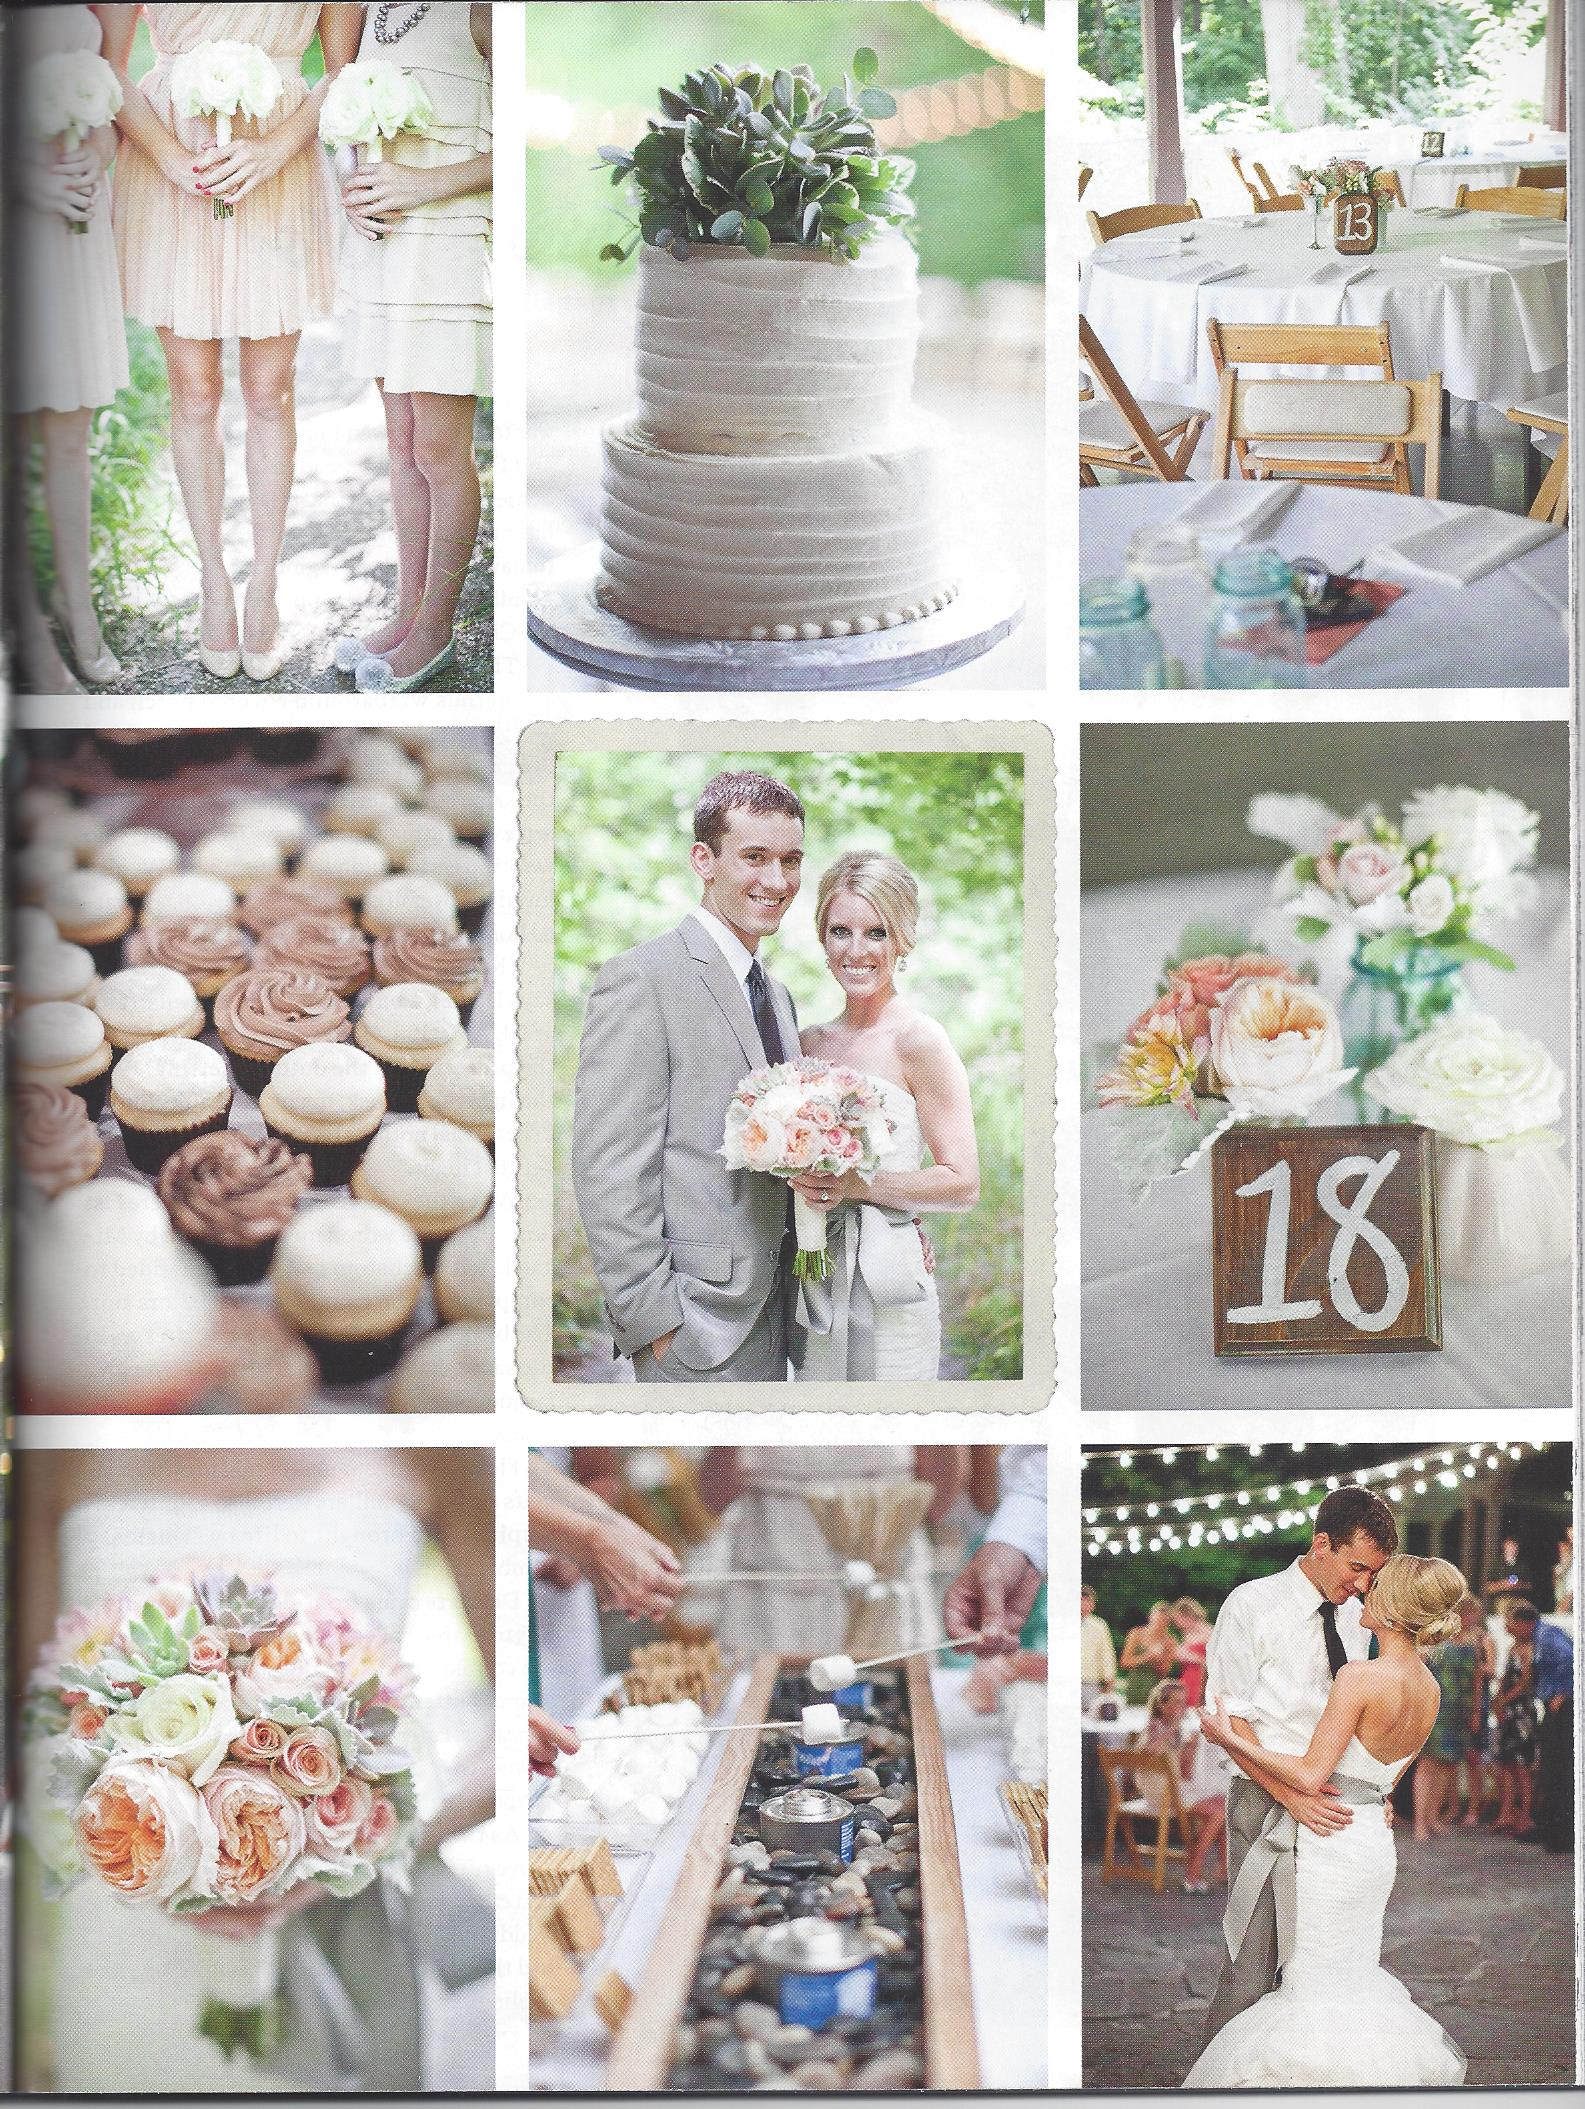 Cincinnati Wedding Fall 2013 1.jpg